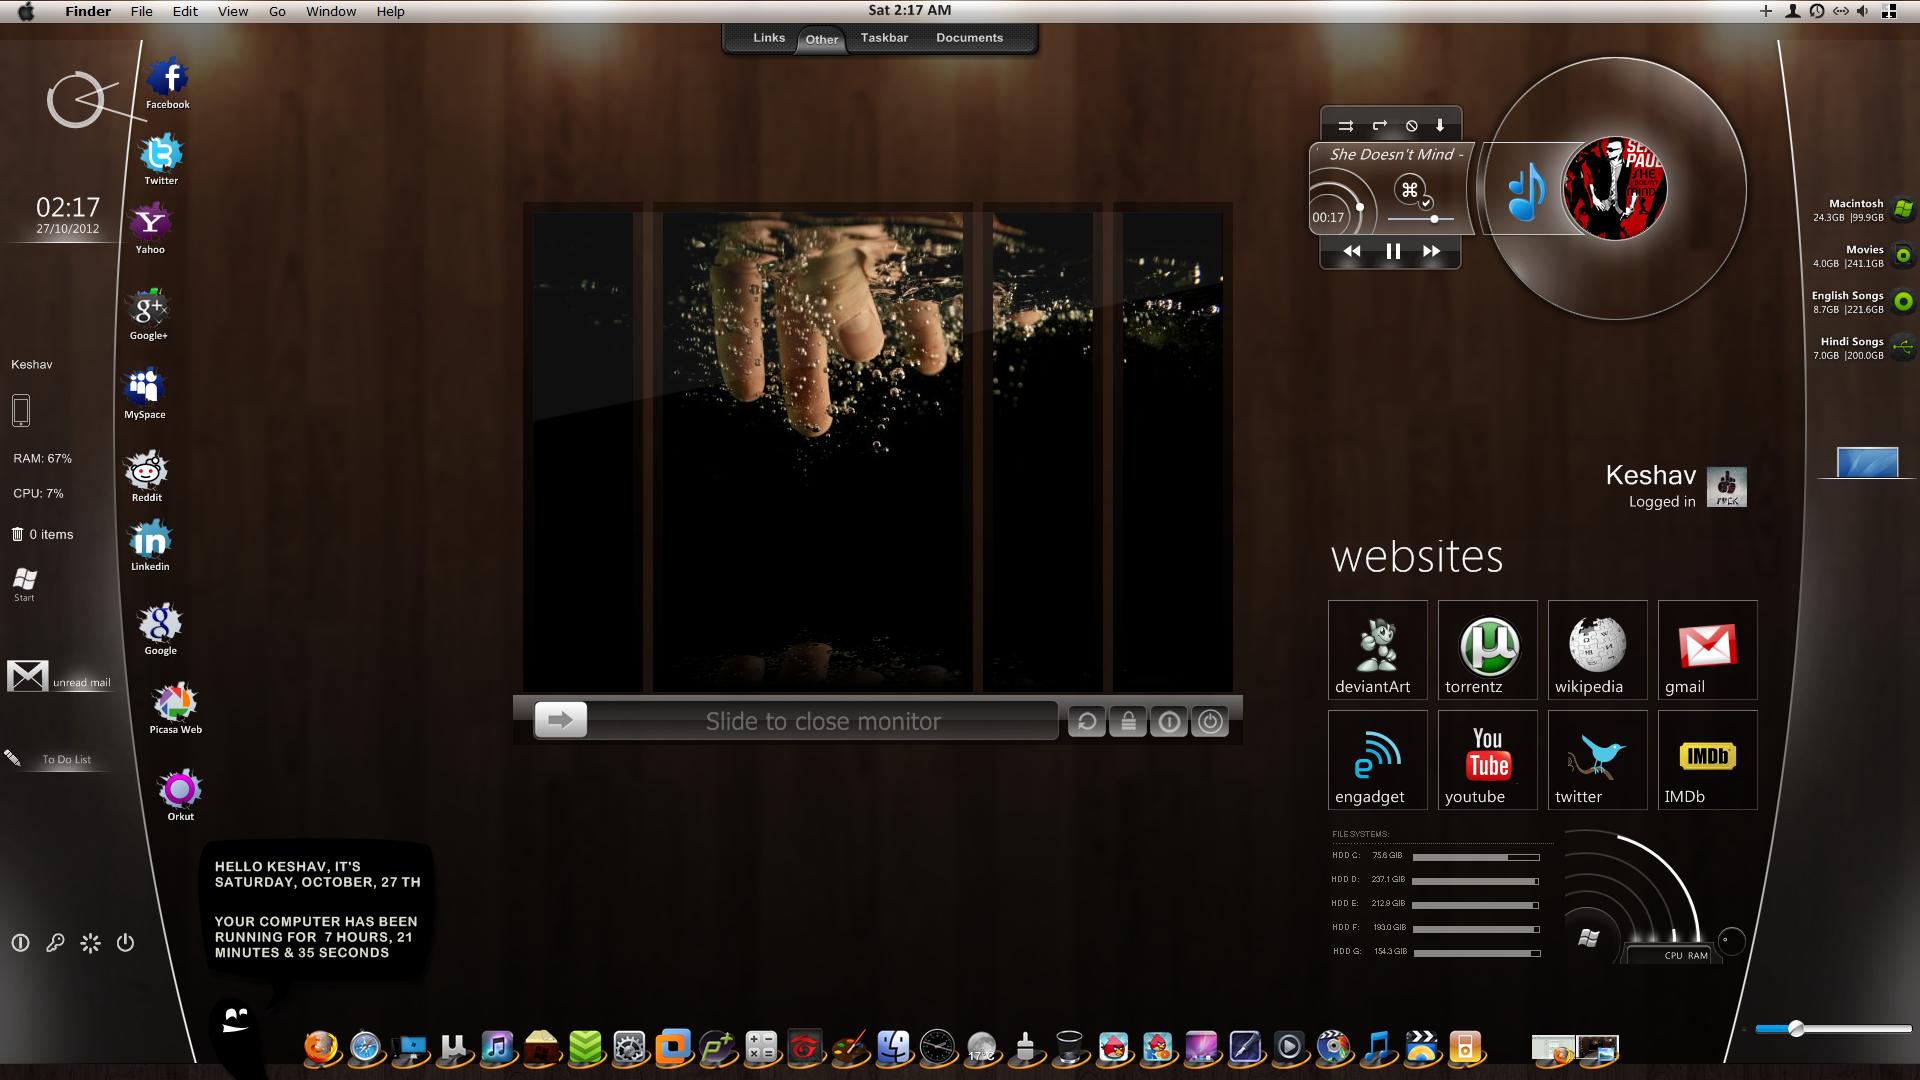 mac skin for windows 7